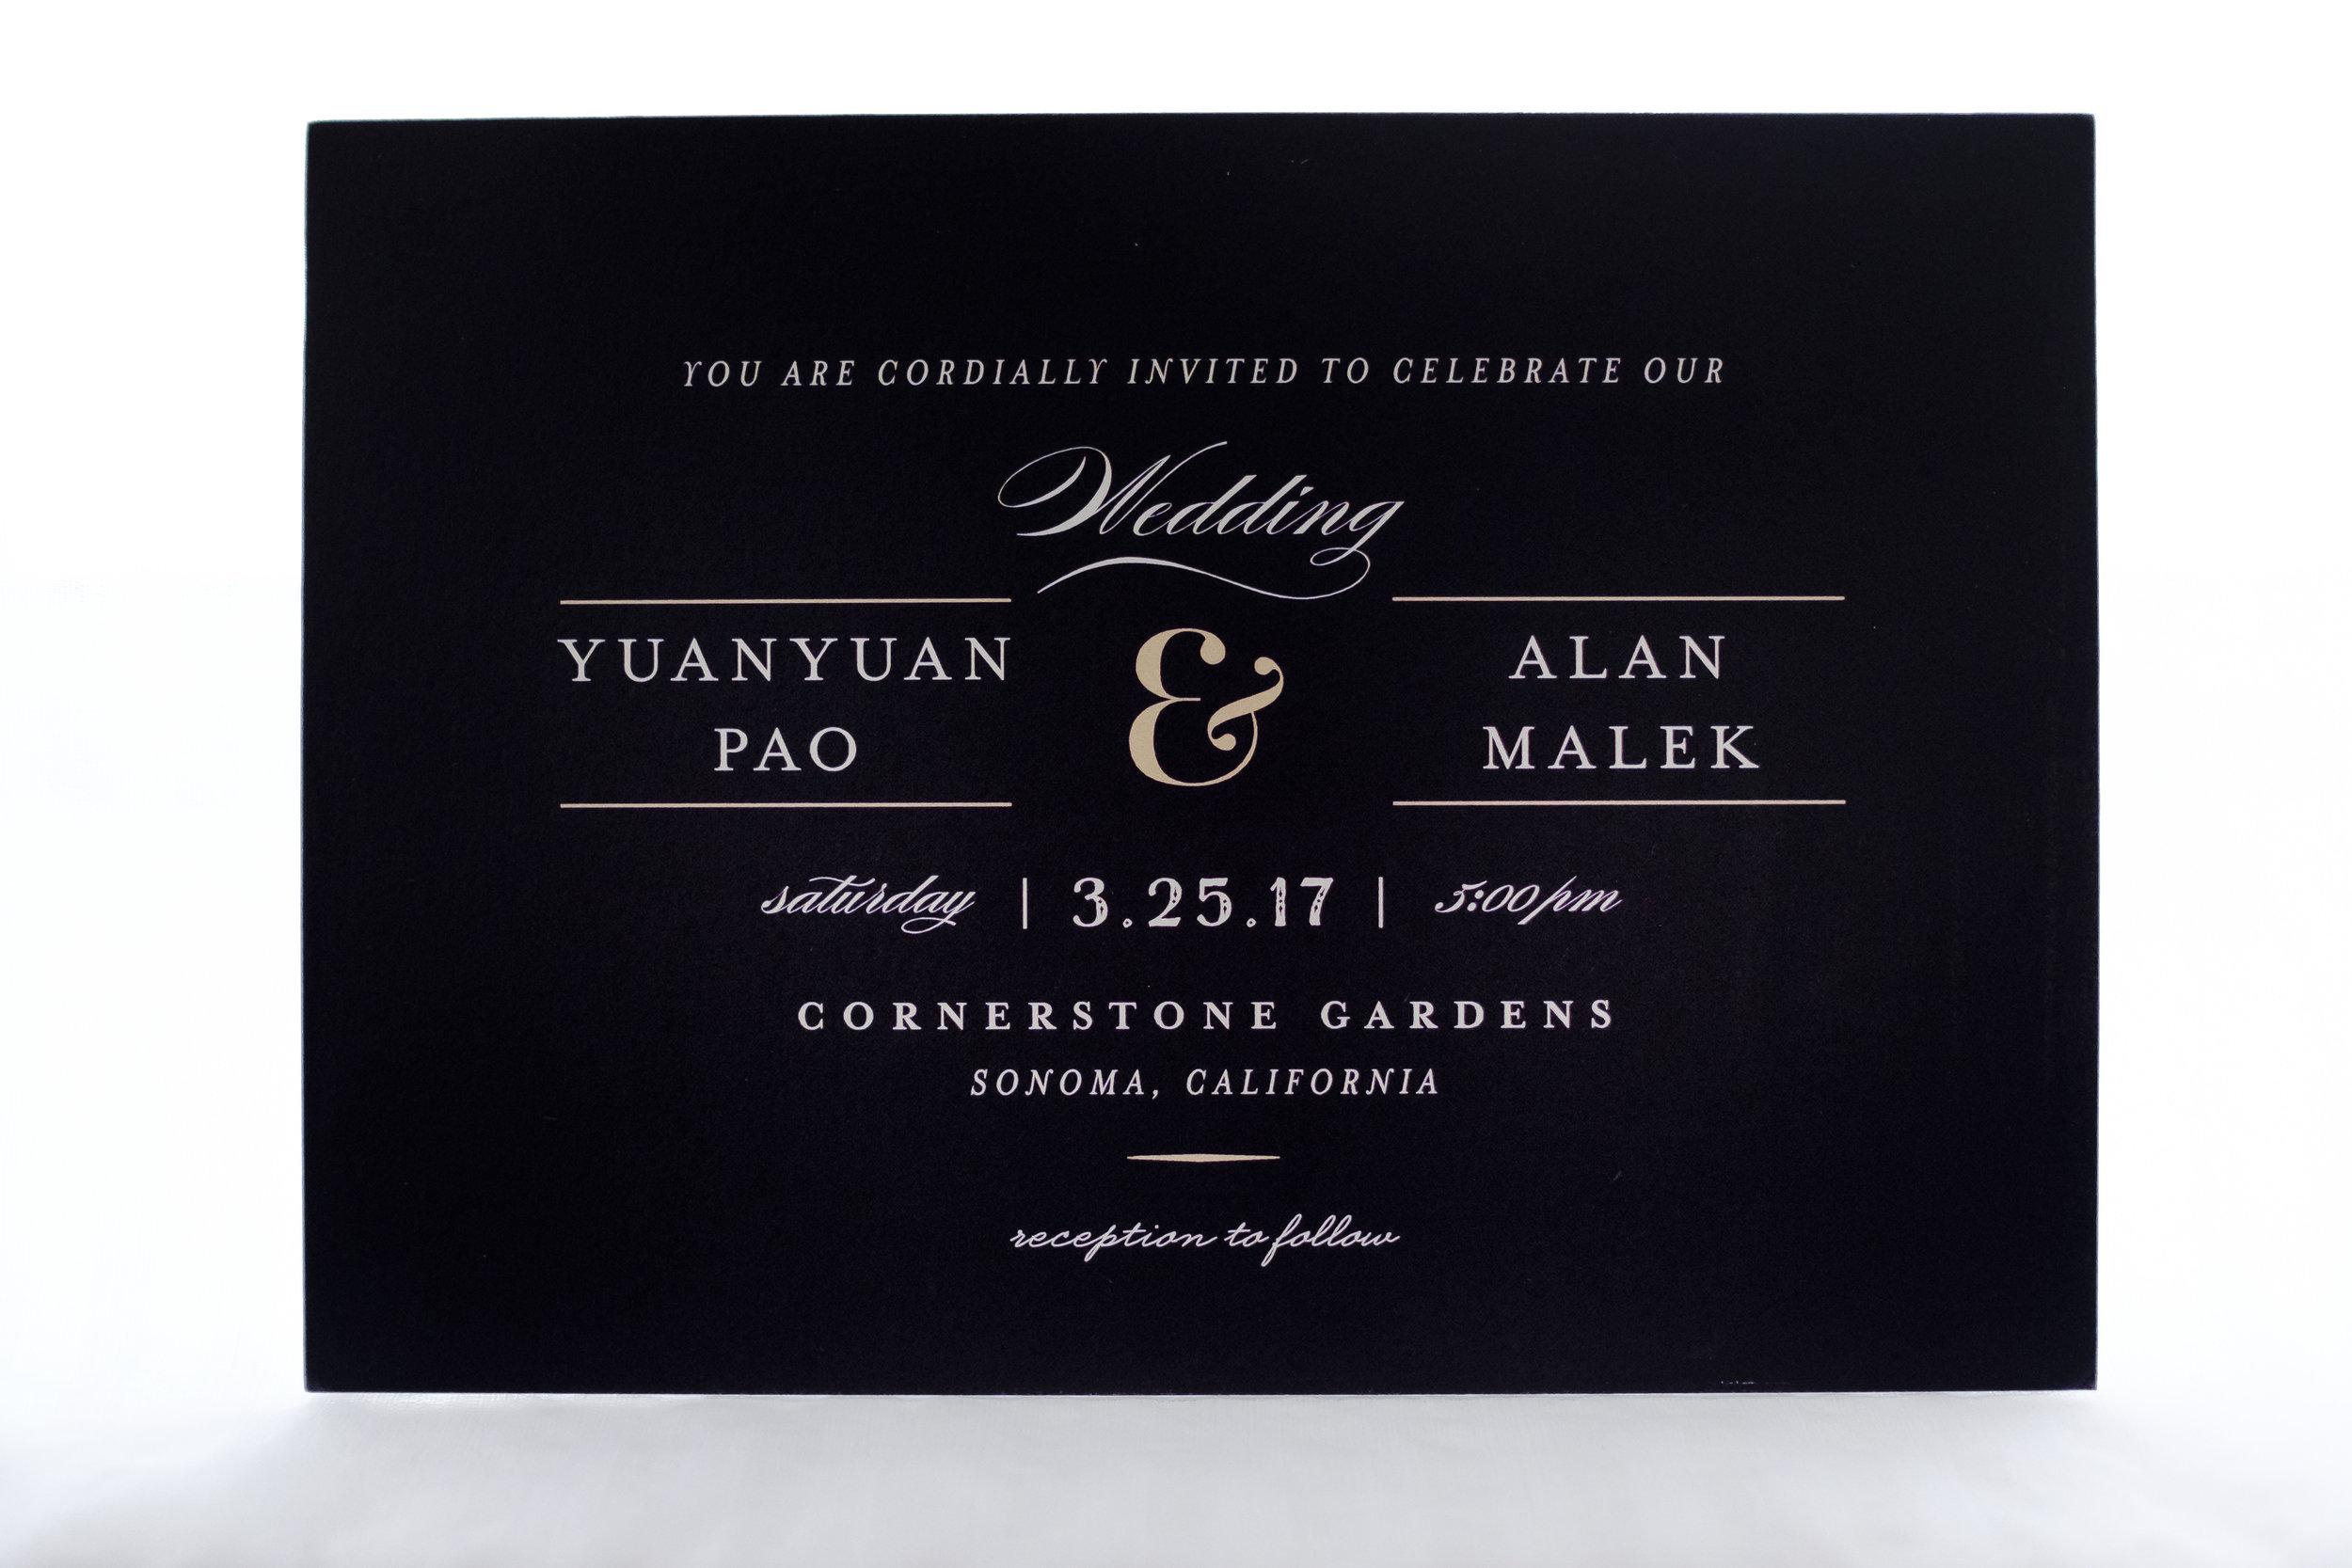 196-20170325-YuanyuanAlan-Malek-wed.jpg